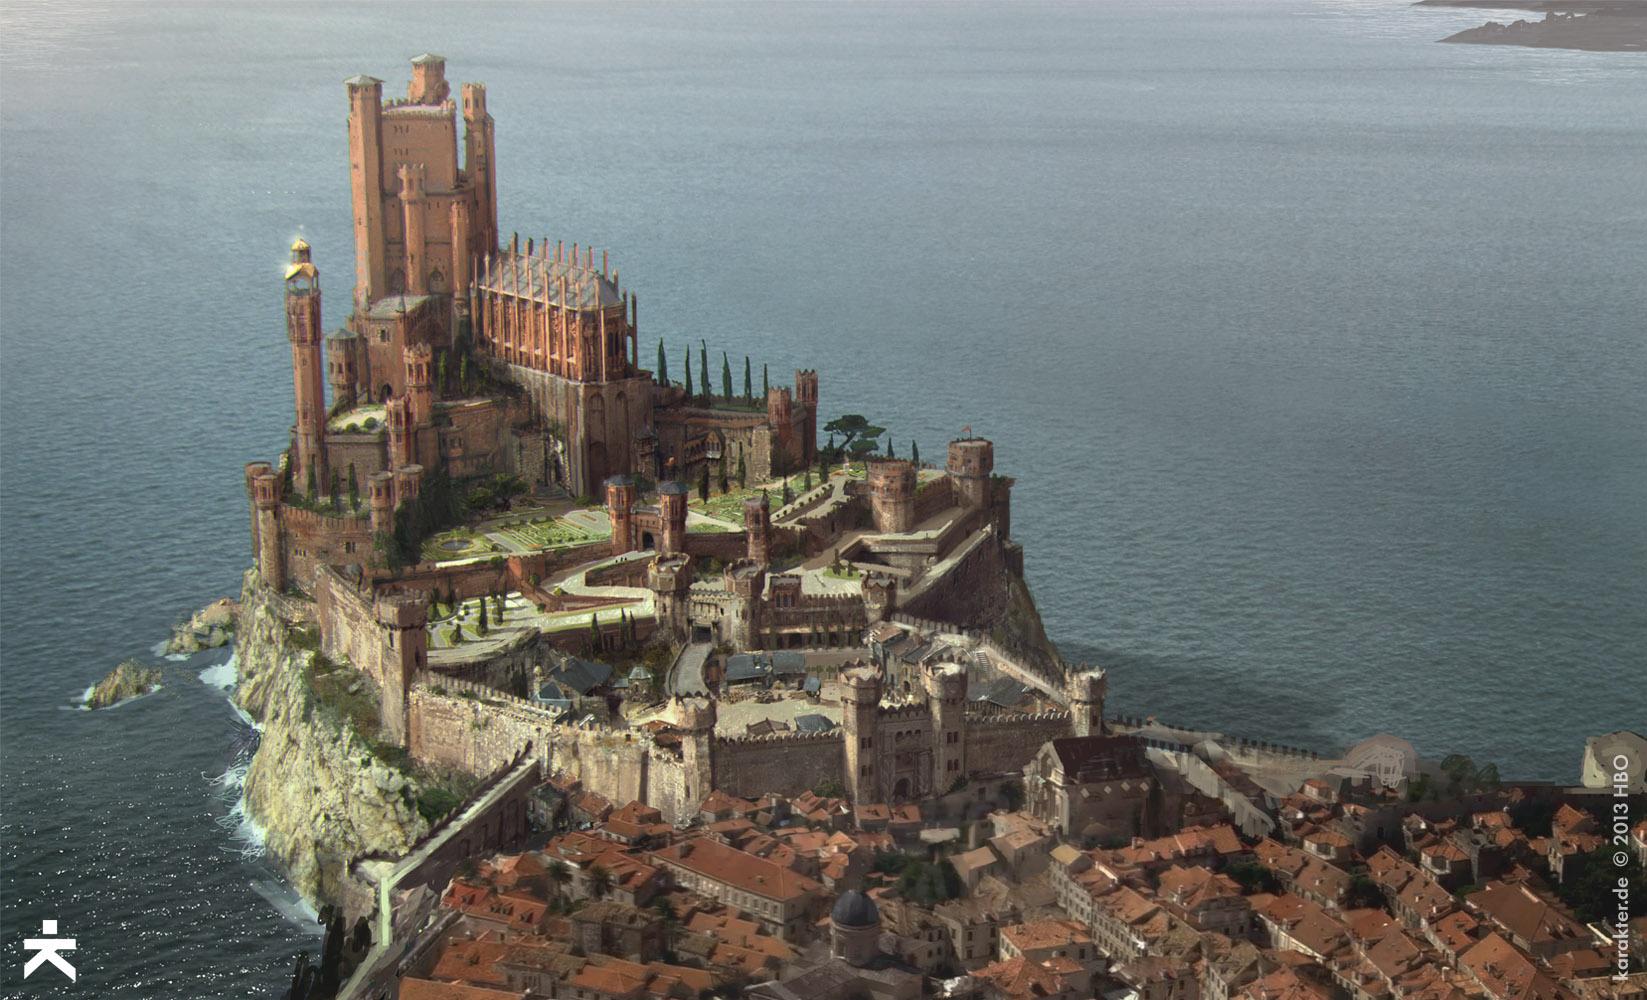 Datei:Königsmund RoterBergfried CA.jpg | Game of Thrones